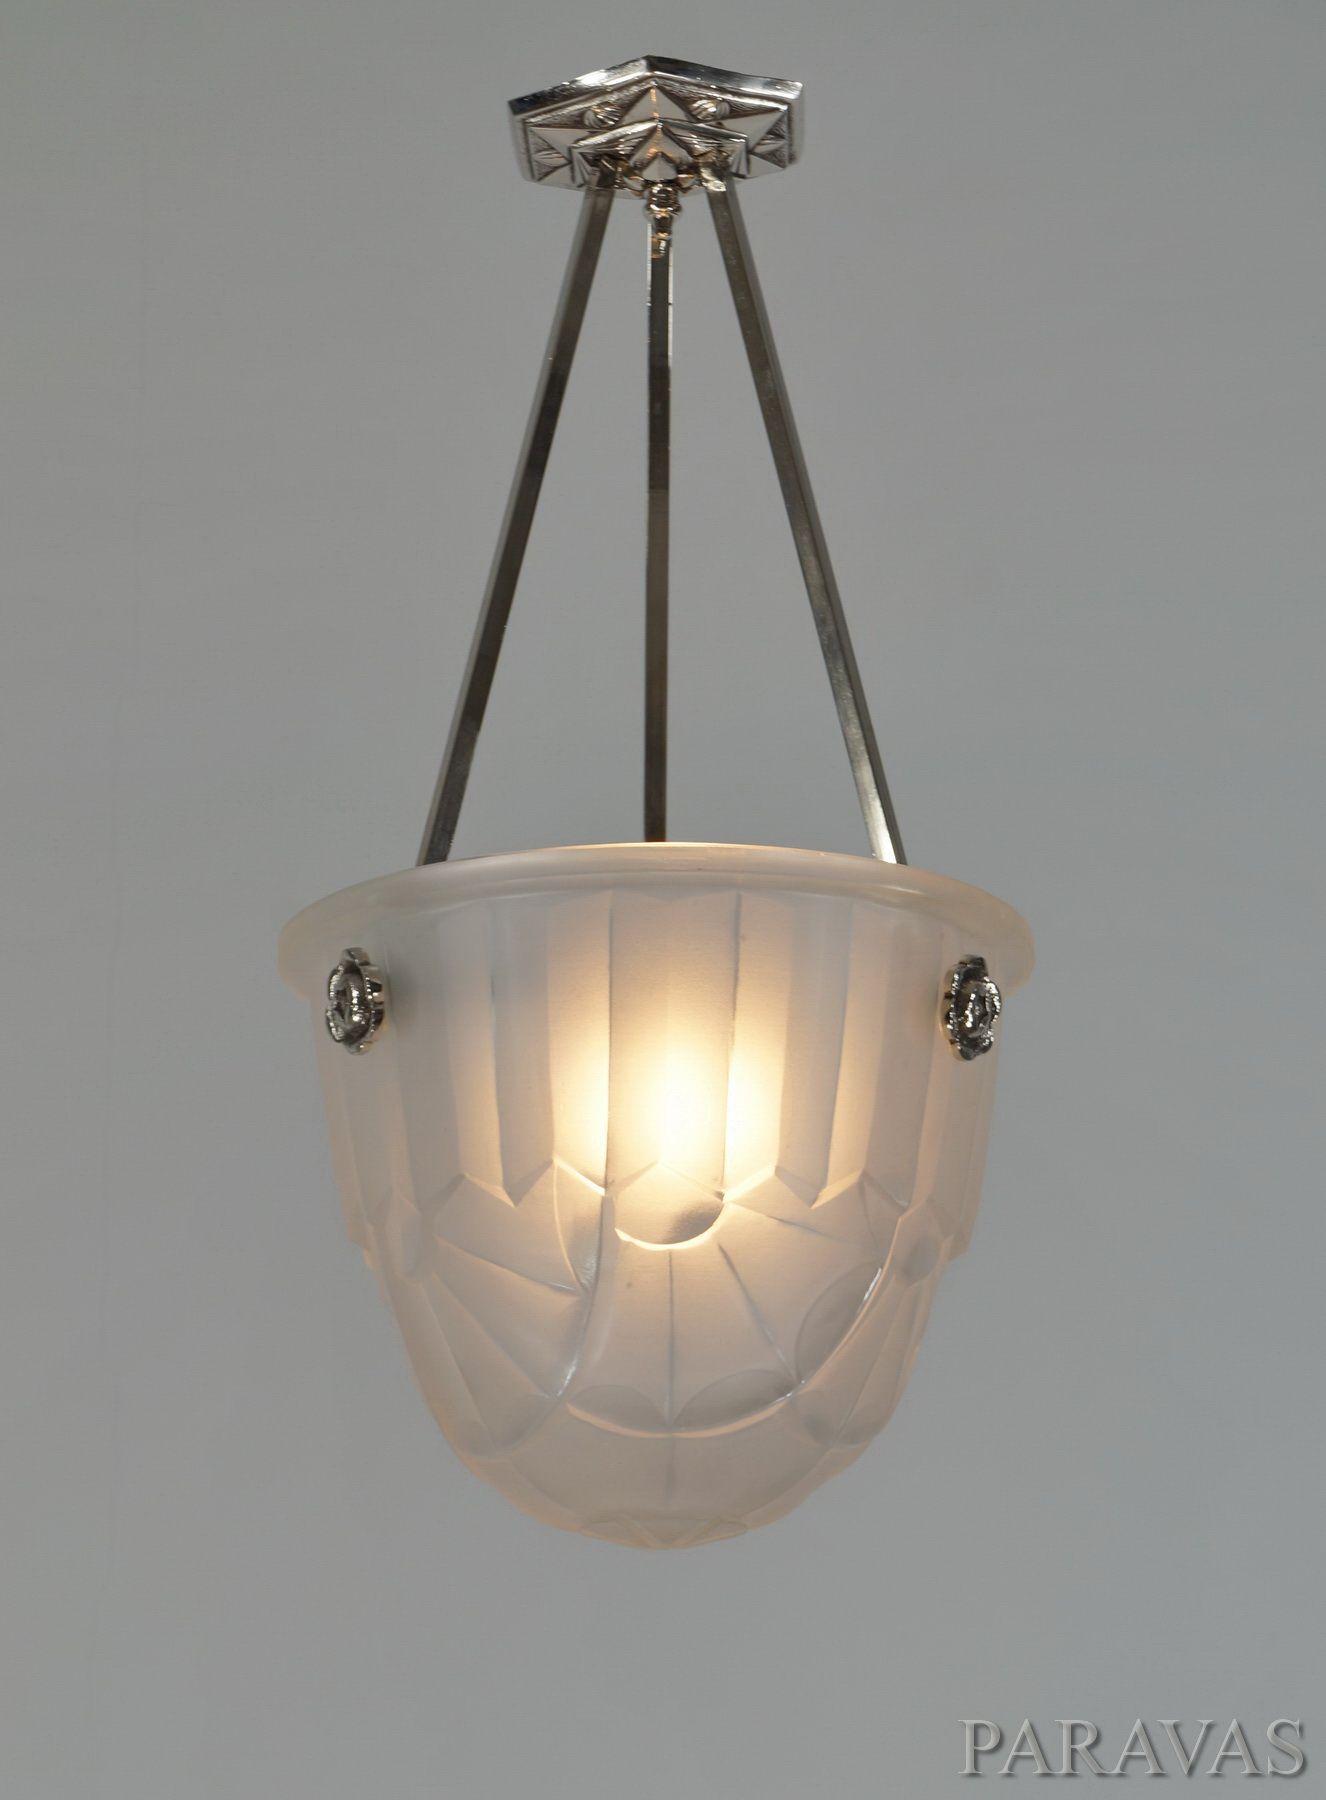 Francis hubens degu french 1930 art deco chandelier paravas francis hubens degu french 1930 art deco chandelier paravas ebay arubaitofo Choice Image